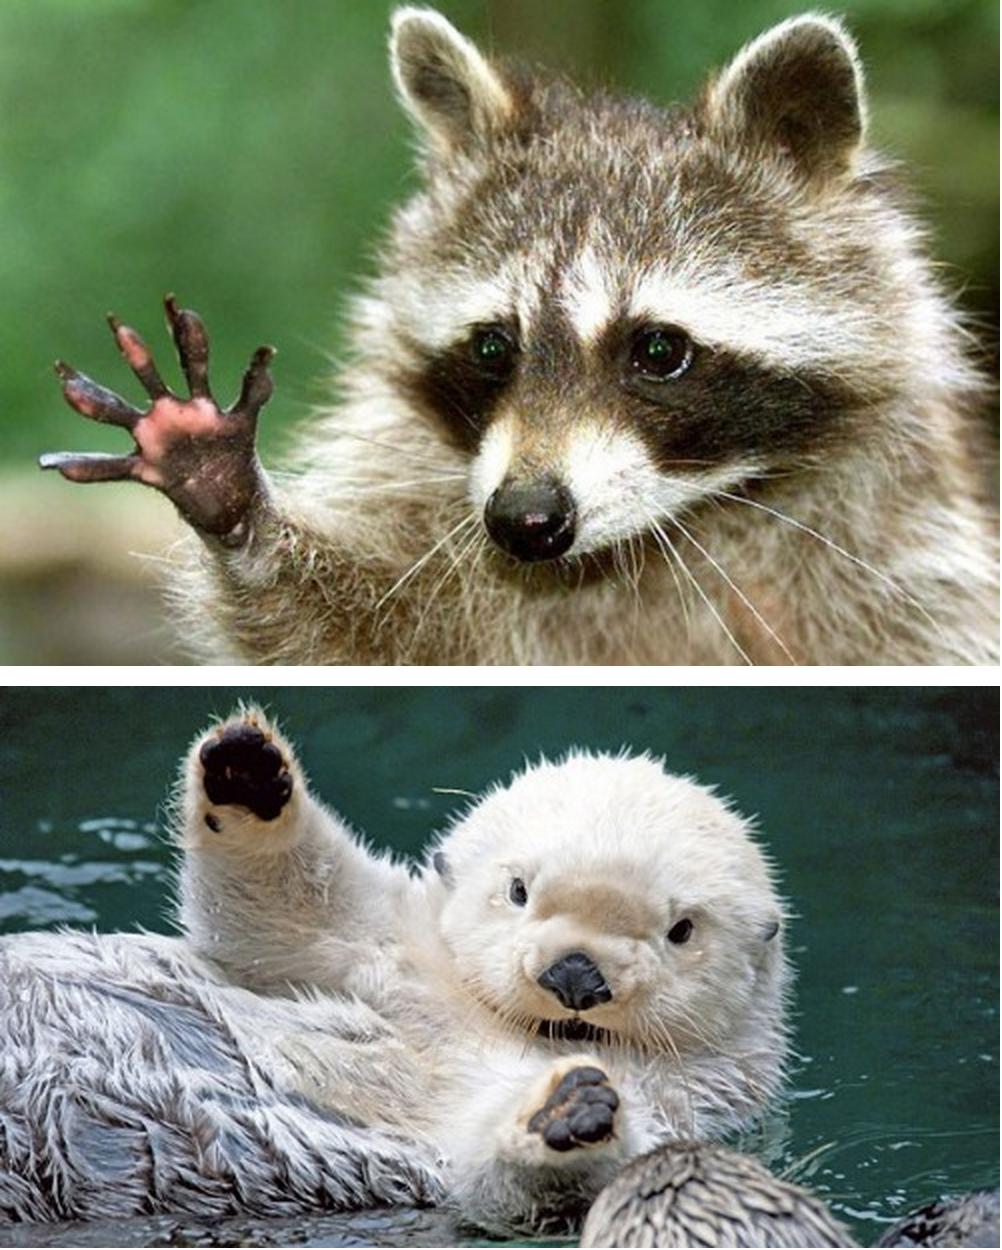 Animals Waving Hello to You [boredpanda] Previously